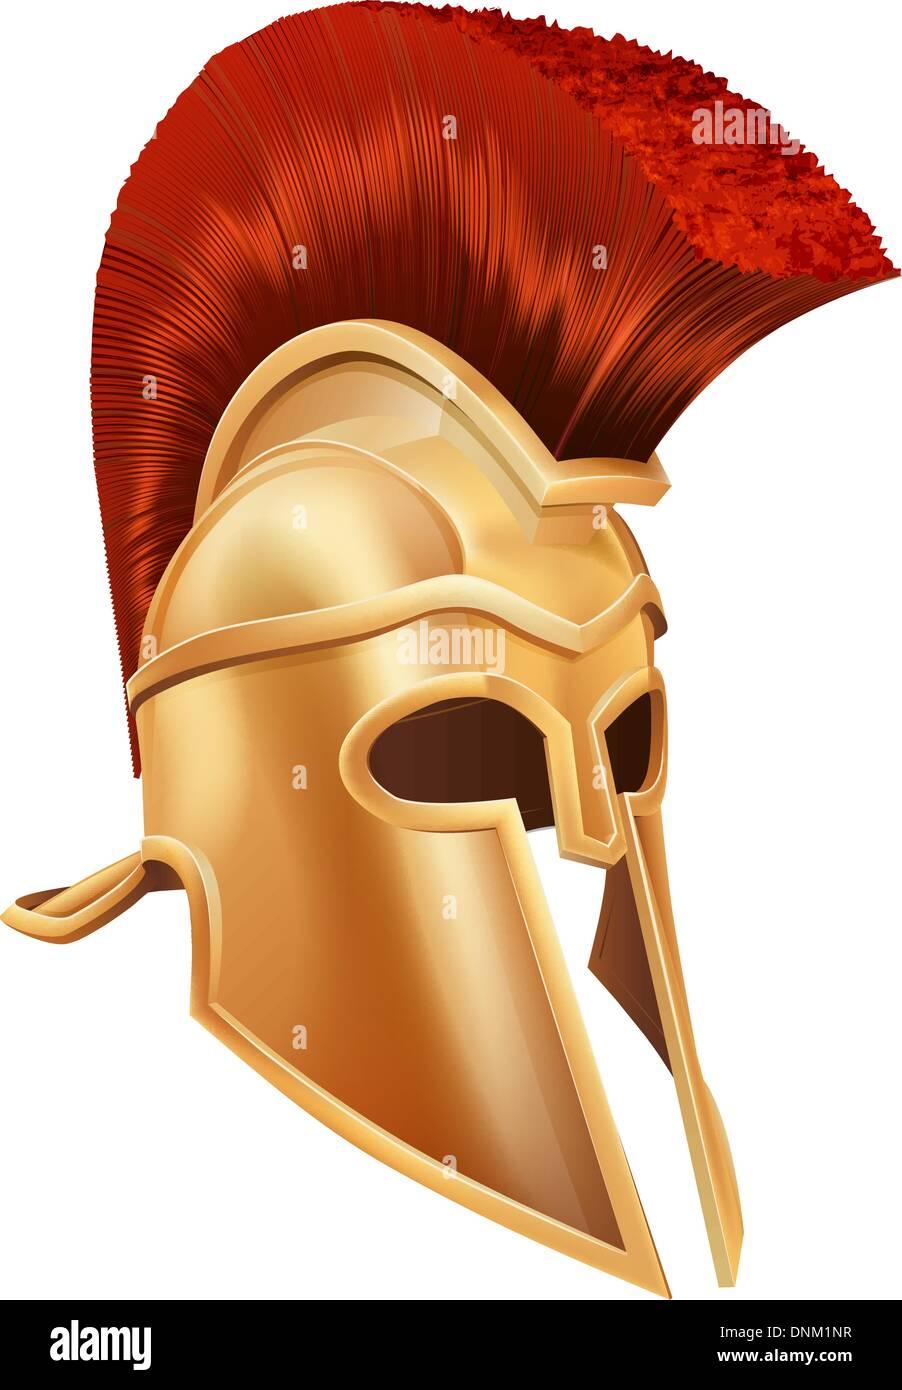 Illustration of a bronze Trojan Helmet, Spartan helmet, Roman helmet or Greek helmet. Corinthian style. - Stock Vector